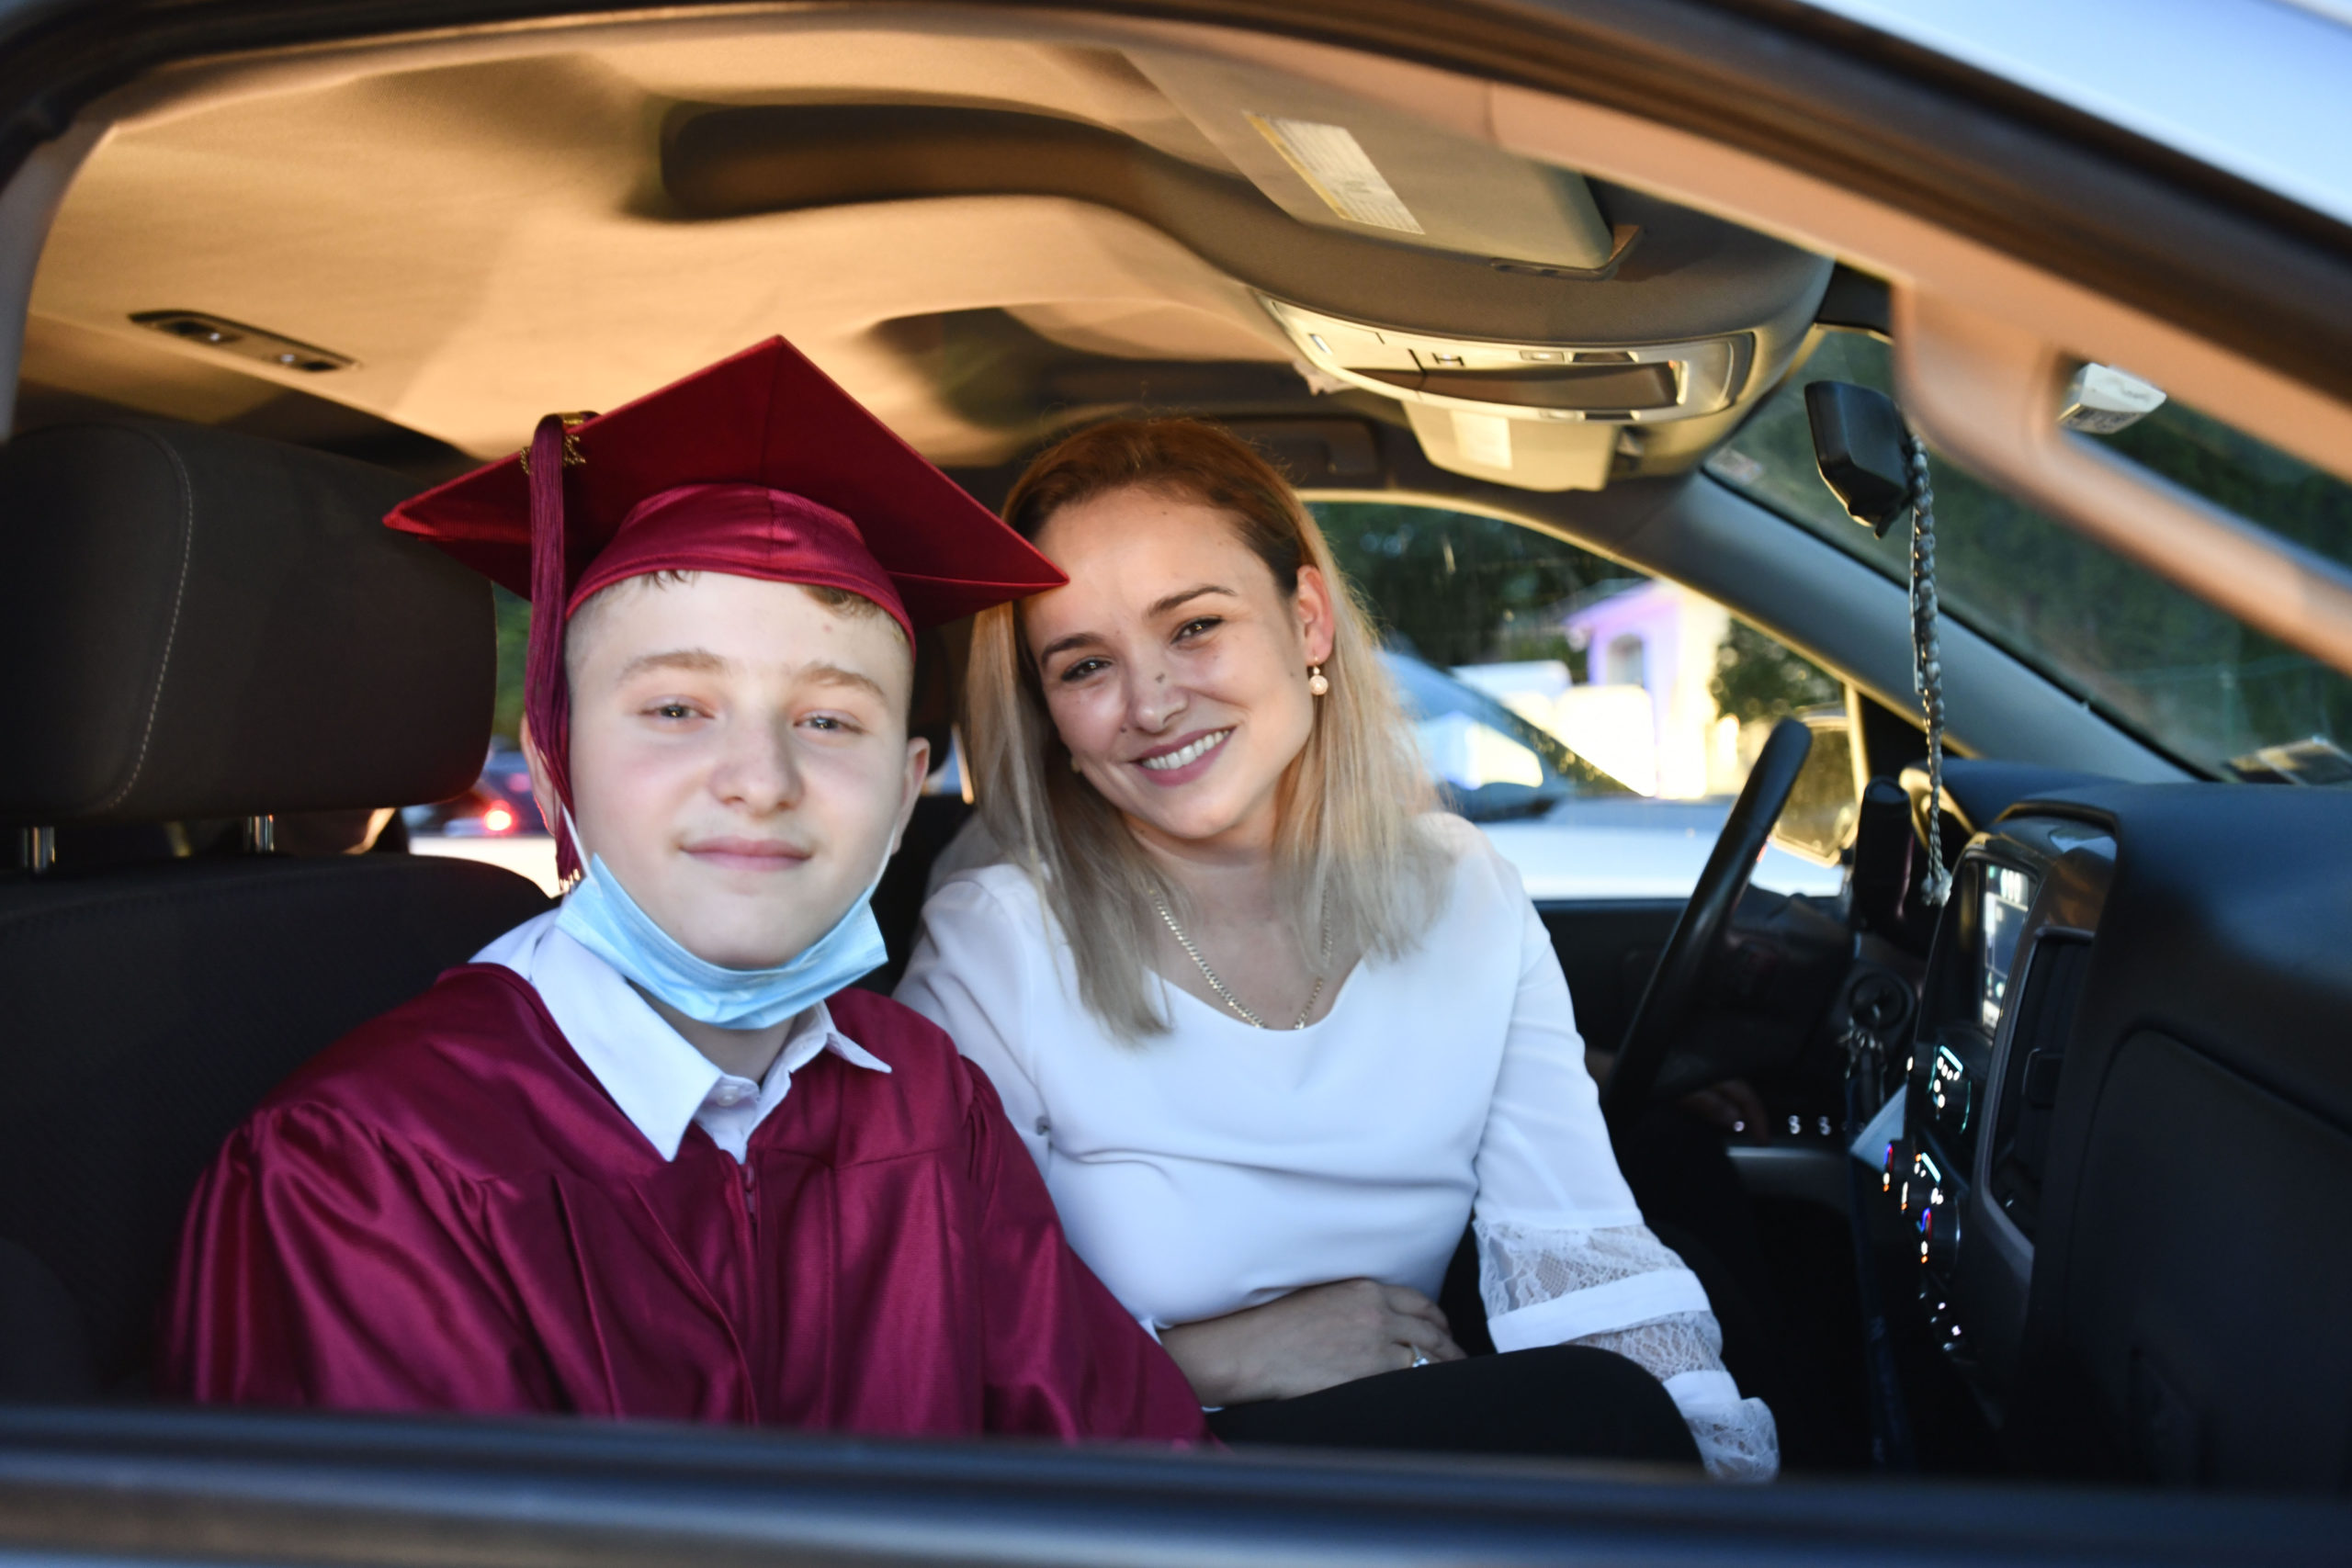 Tuckahoe School co-valedictorian Erion Ruhani, with his mom Valdete, at the Tuckahoe School eighth grade graduation ceremony on Thursday night. DANA SHAW